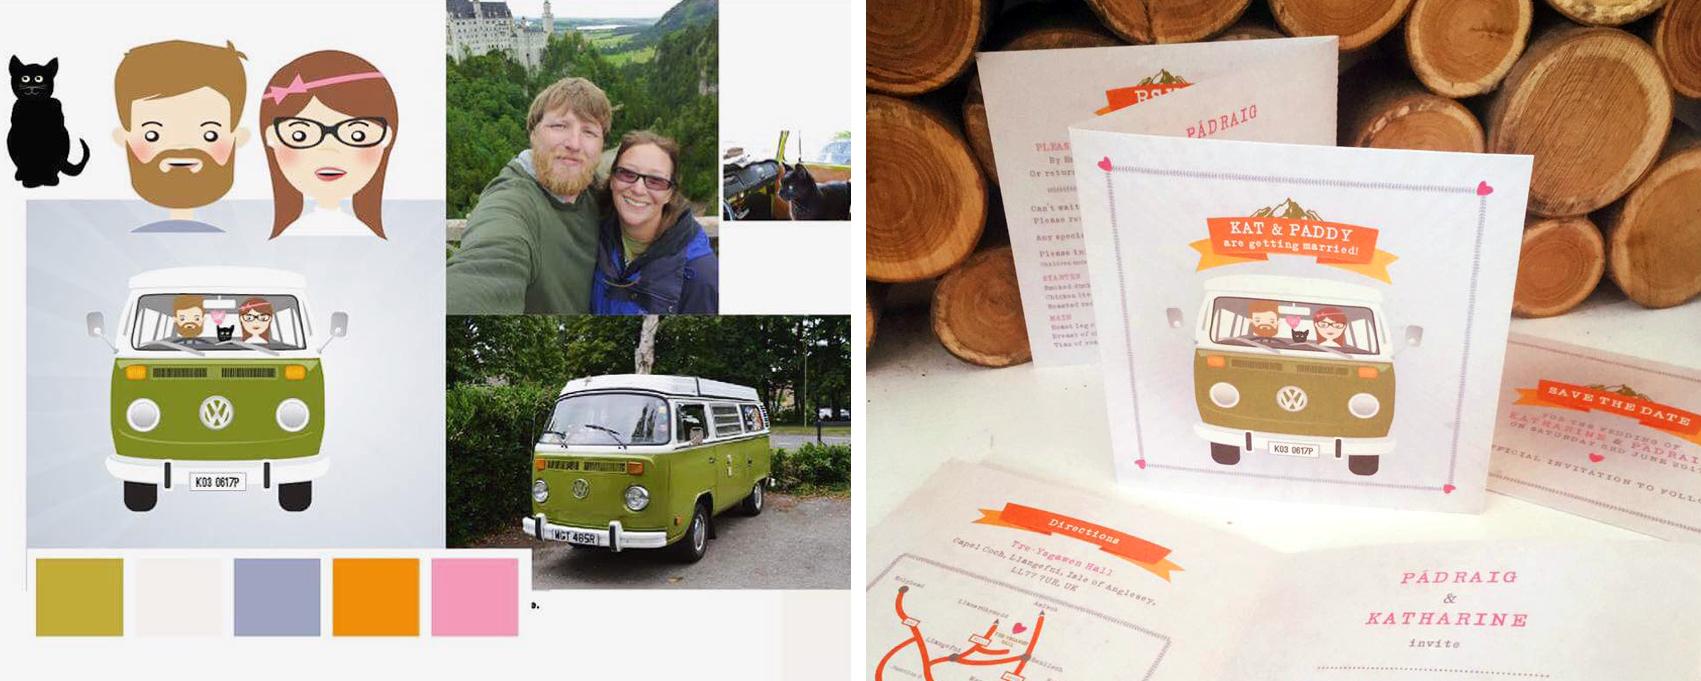 Bespoke wedding stationery - Bride and Groom Campervan Wedding Invite Design